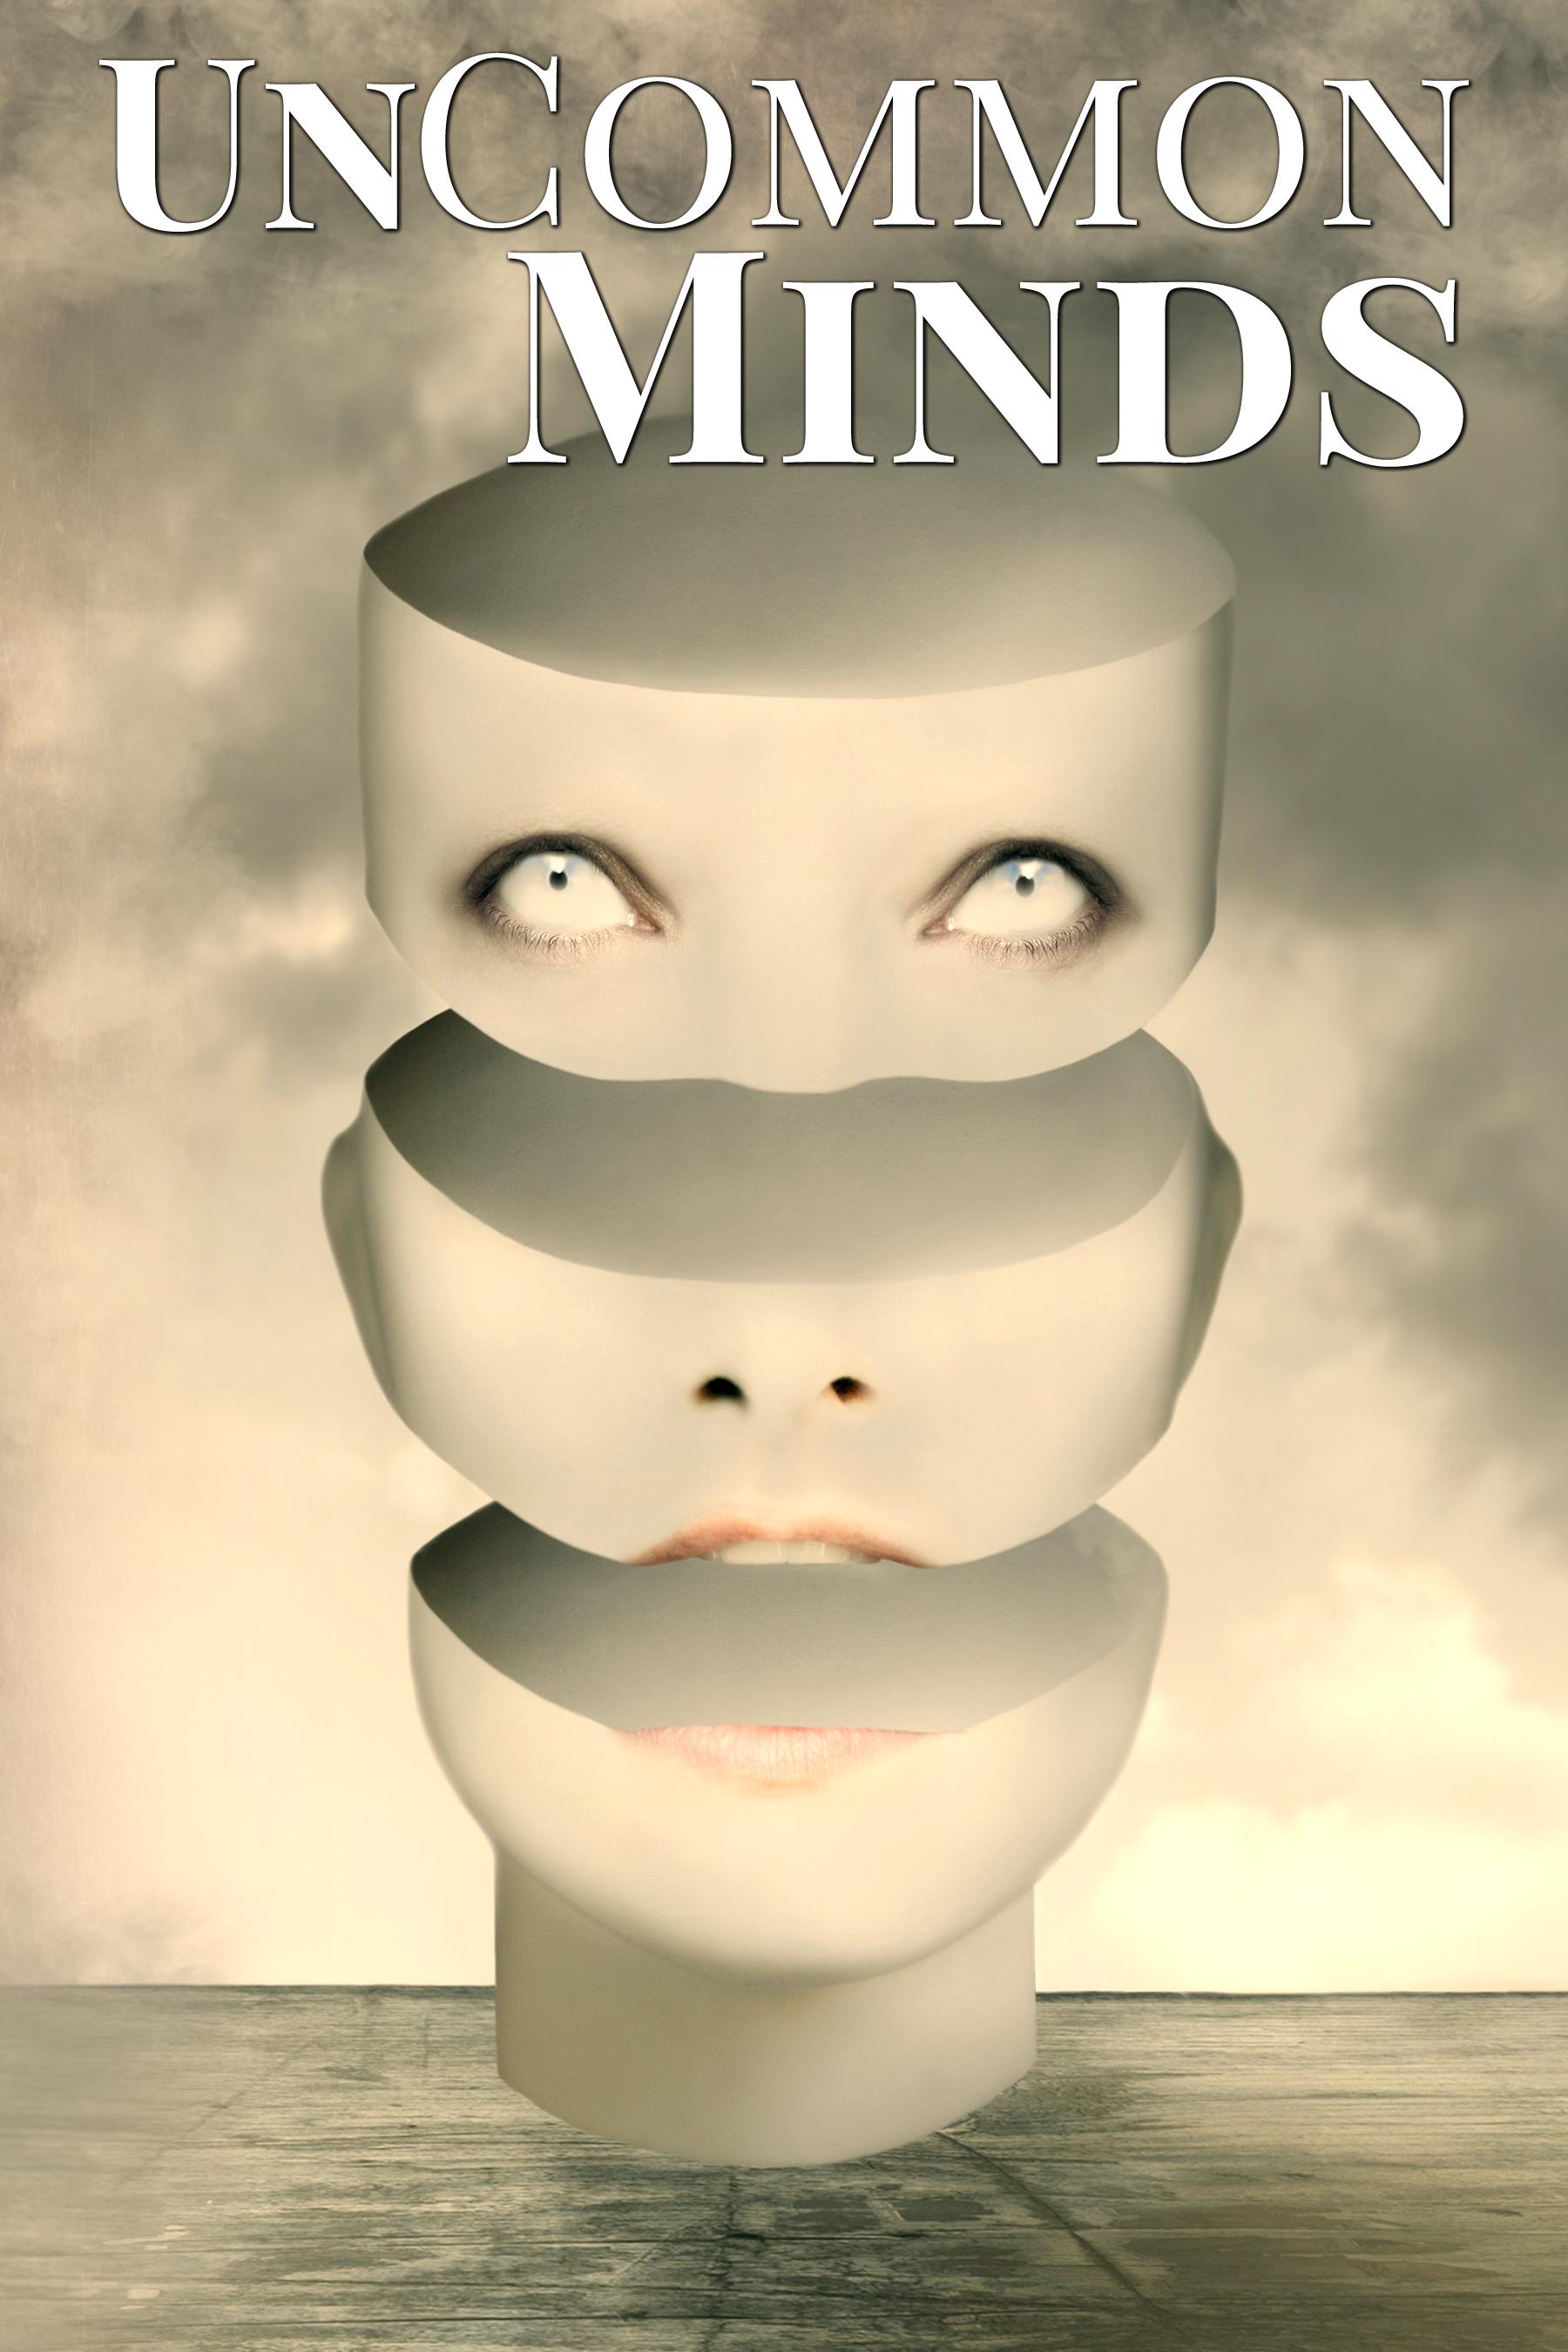 UnCommon Minds